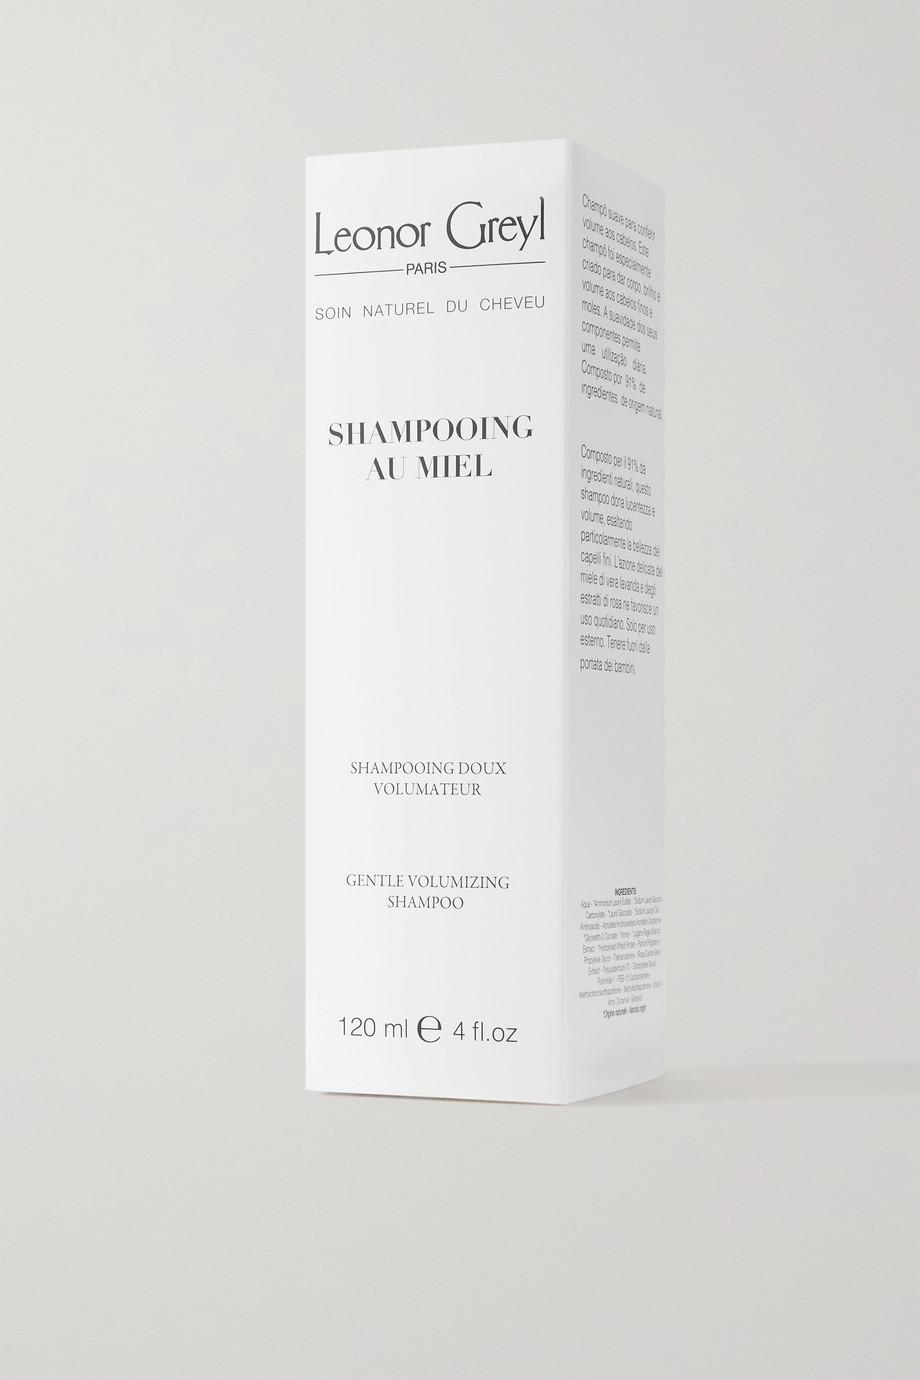 Leonor Greyl Paris Gentle Volumizing Shampoo, 120ml